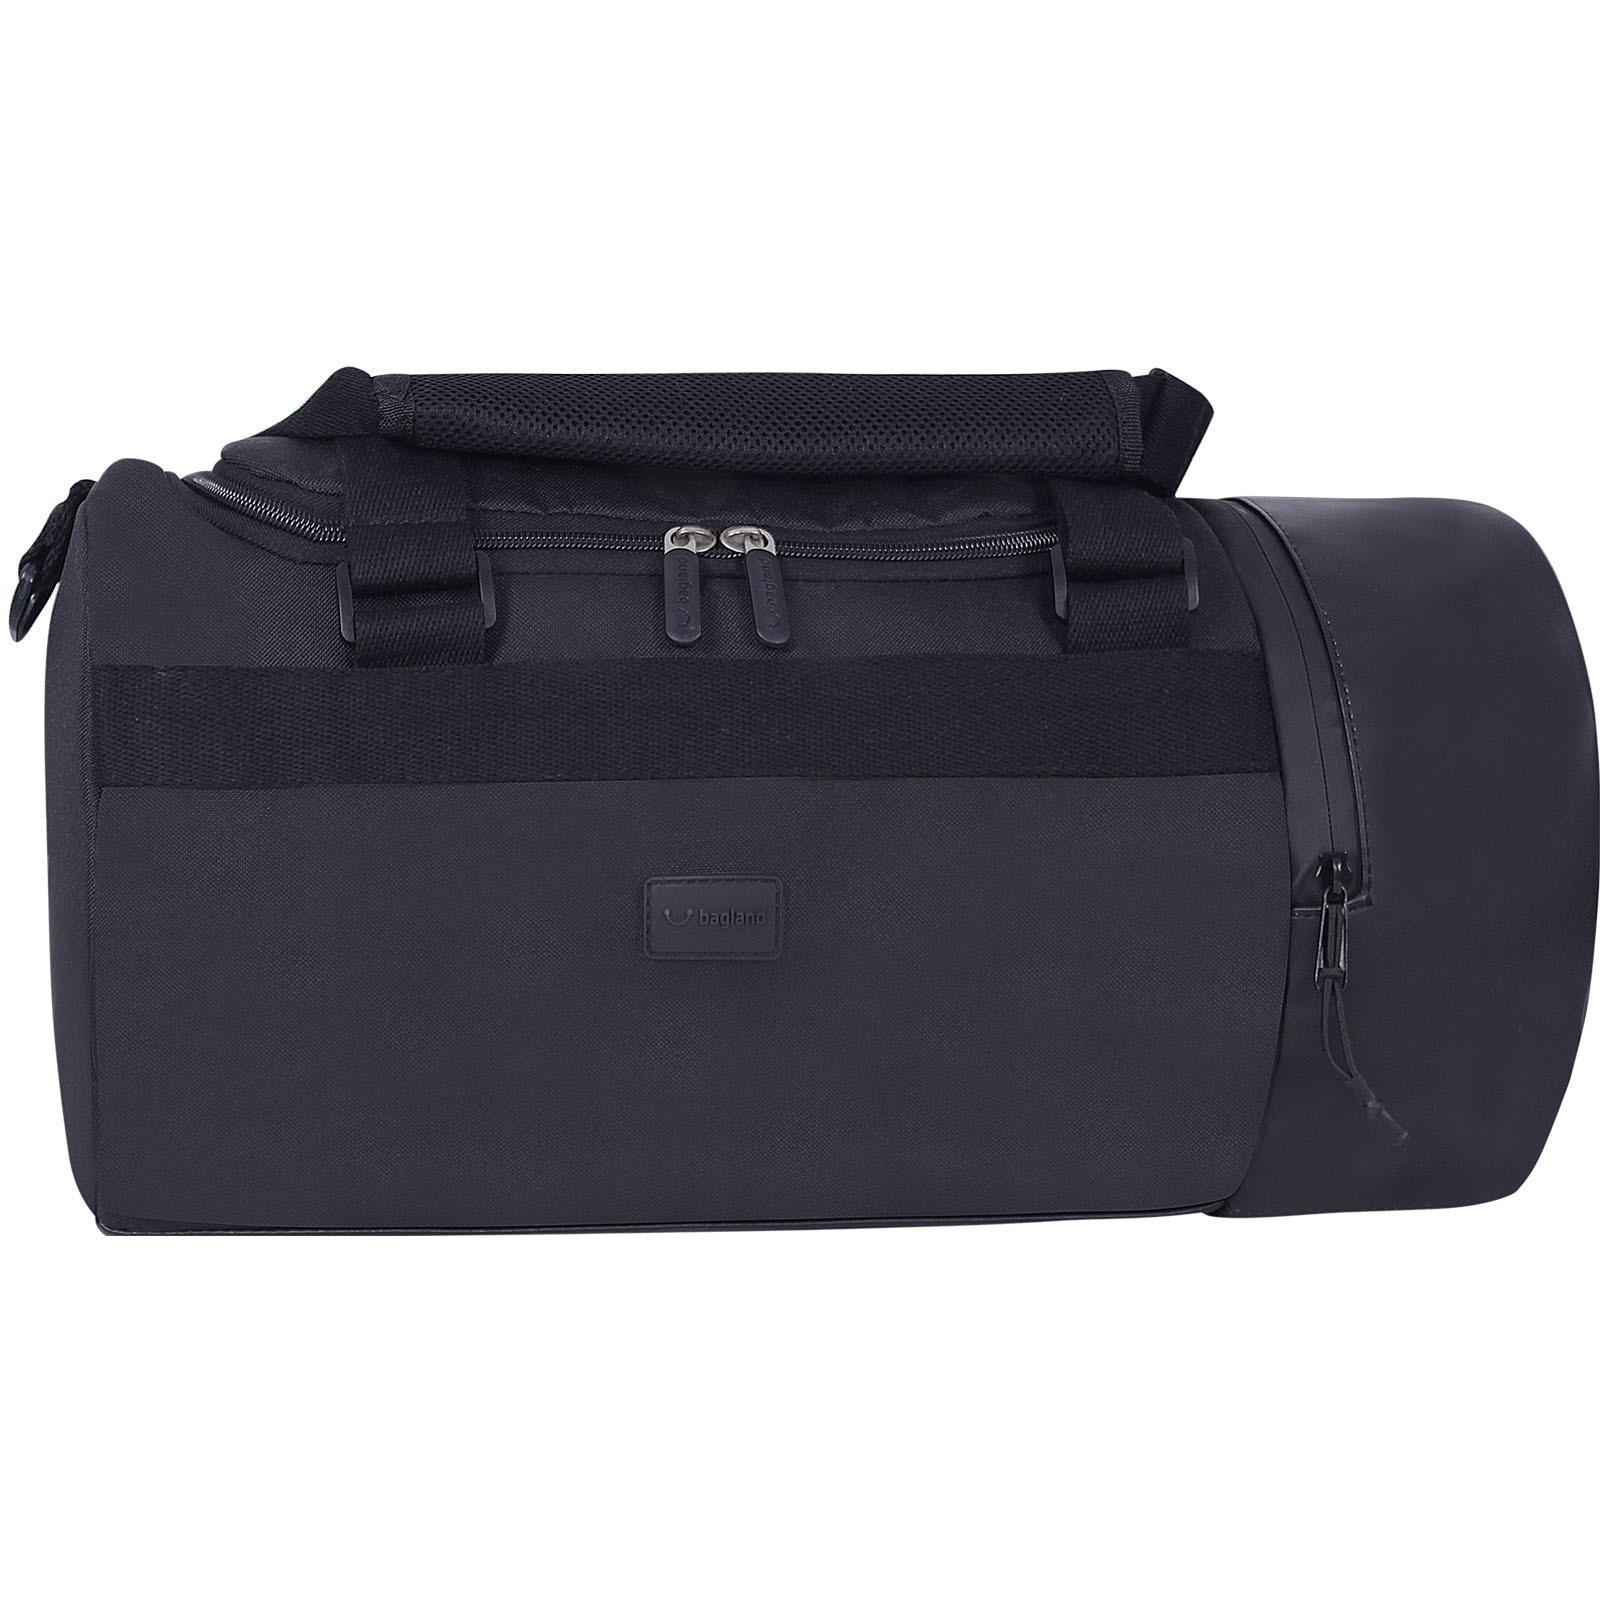 Спортивные сумки Сумка Bagland Klerk 22 л. Чёрный (0032766) IMG_5968-1600.jpg